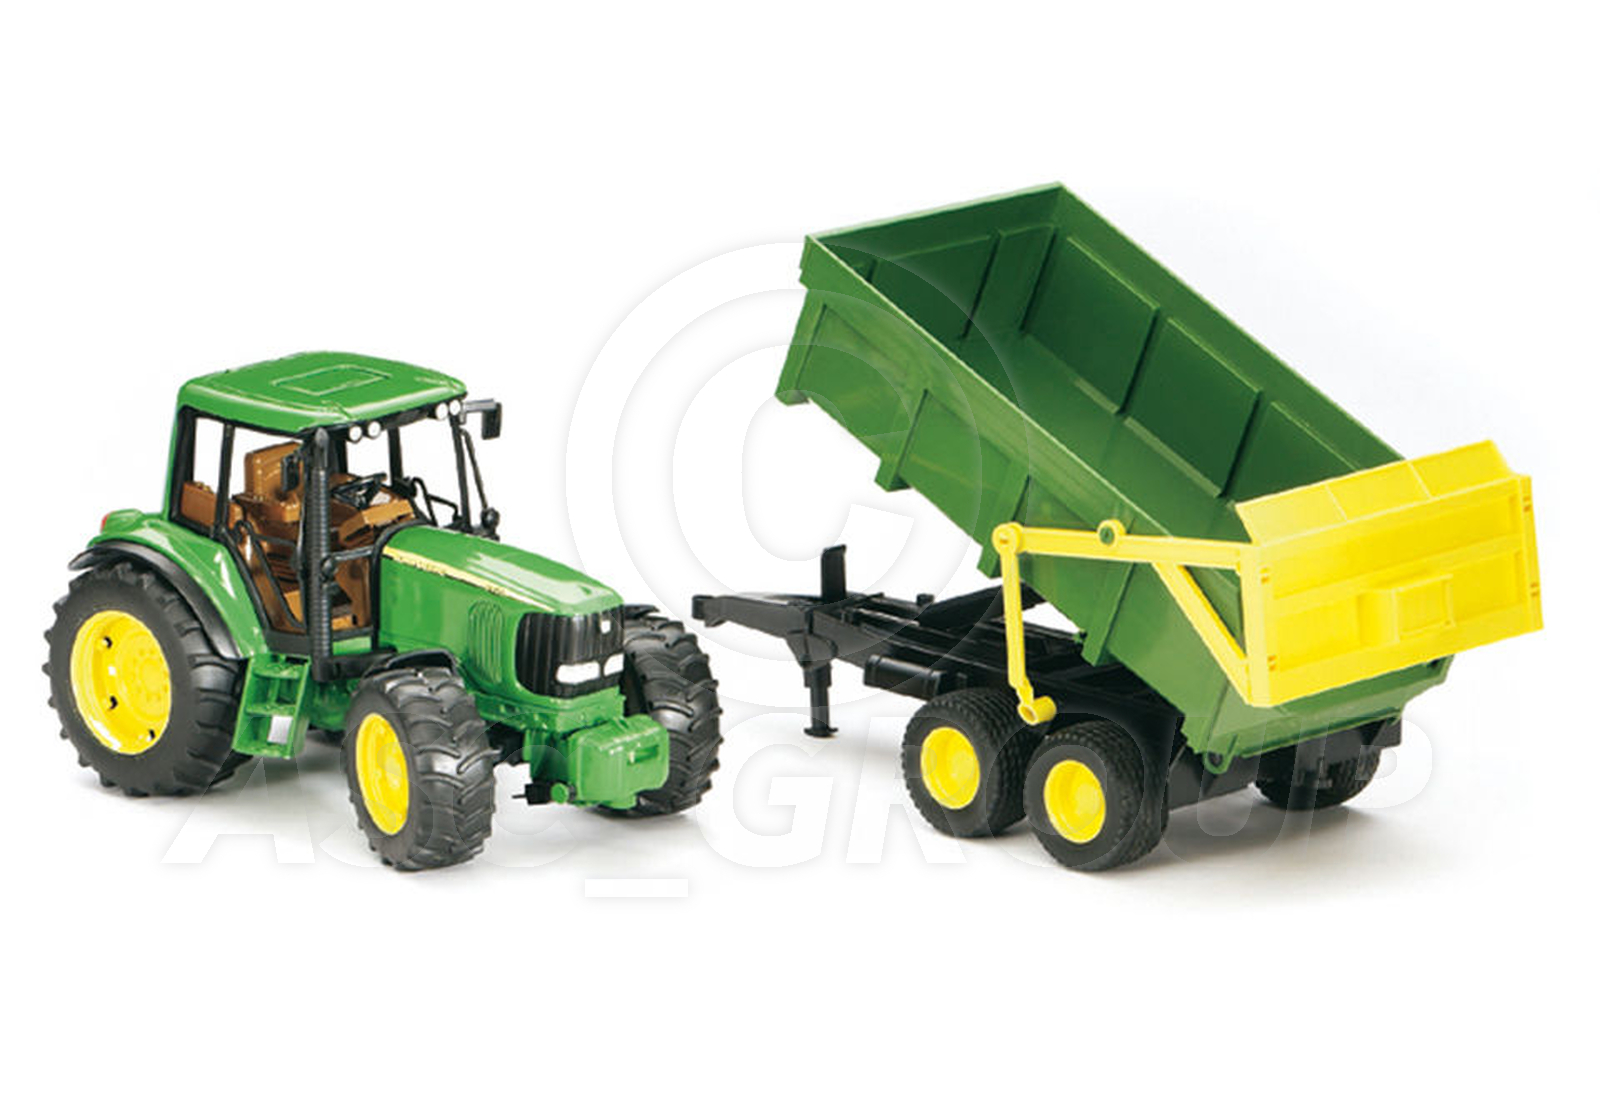 John Deere Trailor : Bruder toys pro series john deere tractor